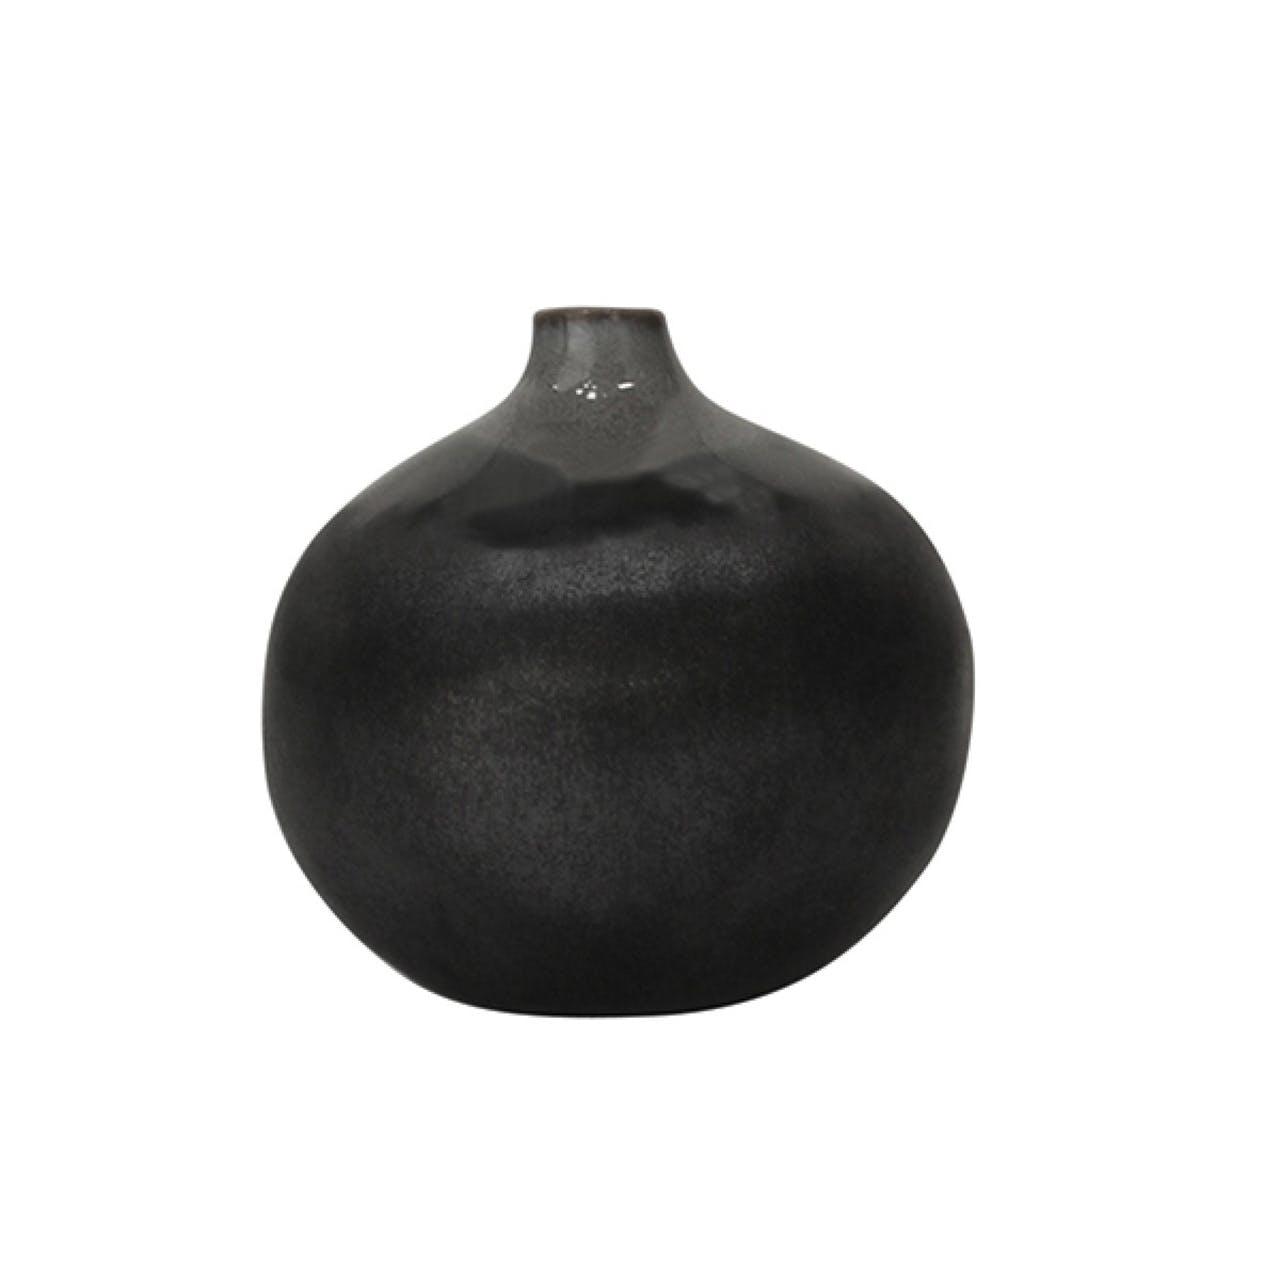 Louise Smærup sort keramik vase